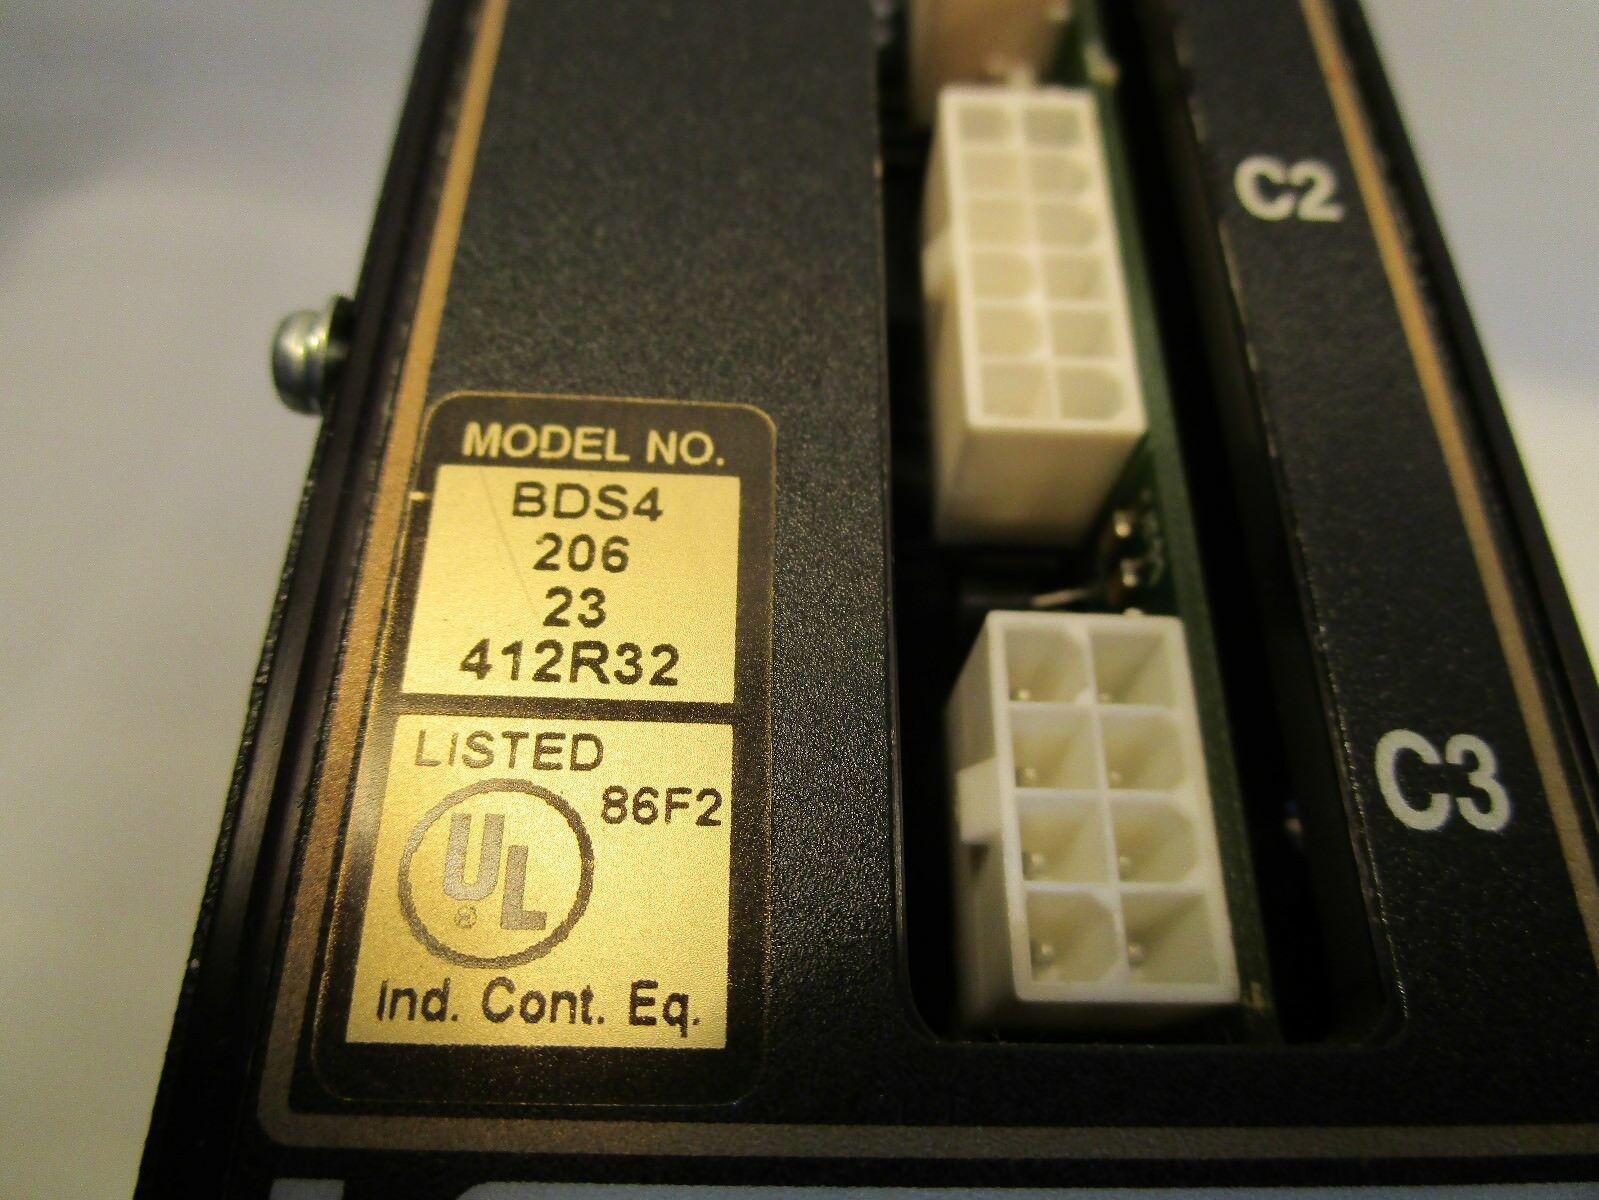 Kollmorgen Cincinnati Servo amplifier module Servo Axis Drive BDS4-206-23-412R32